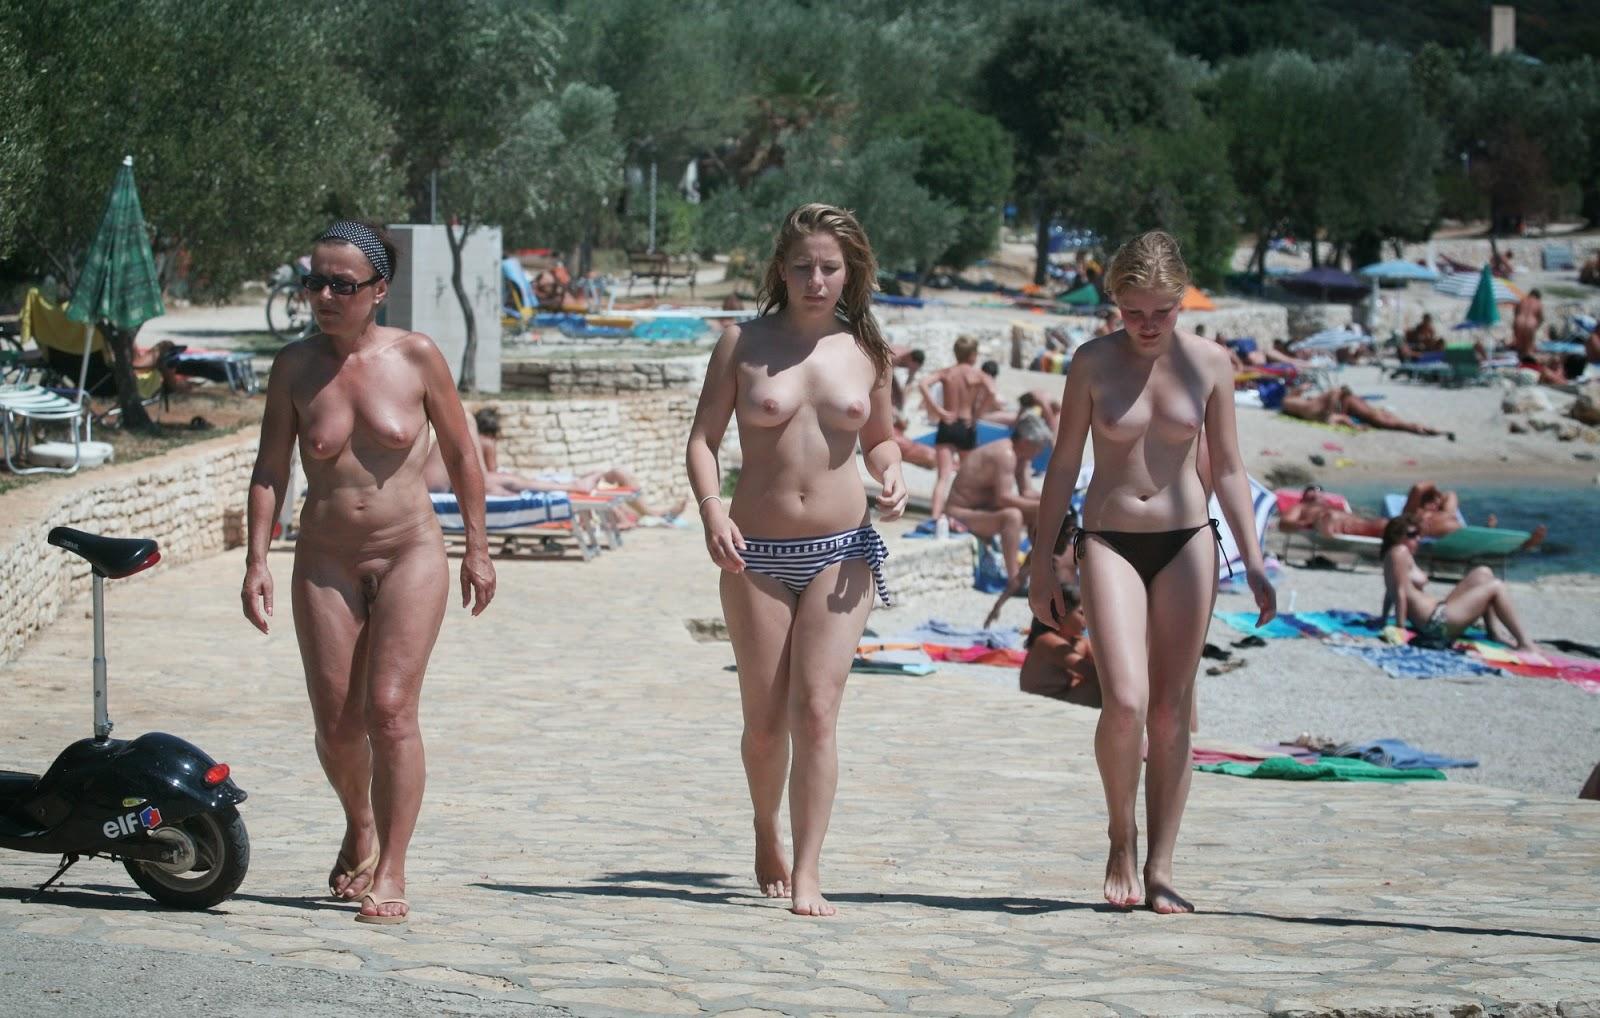 Pity, nude girls valalta